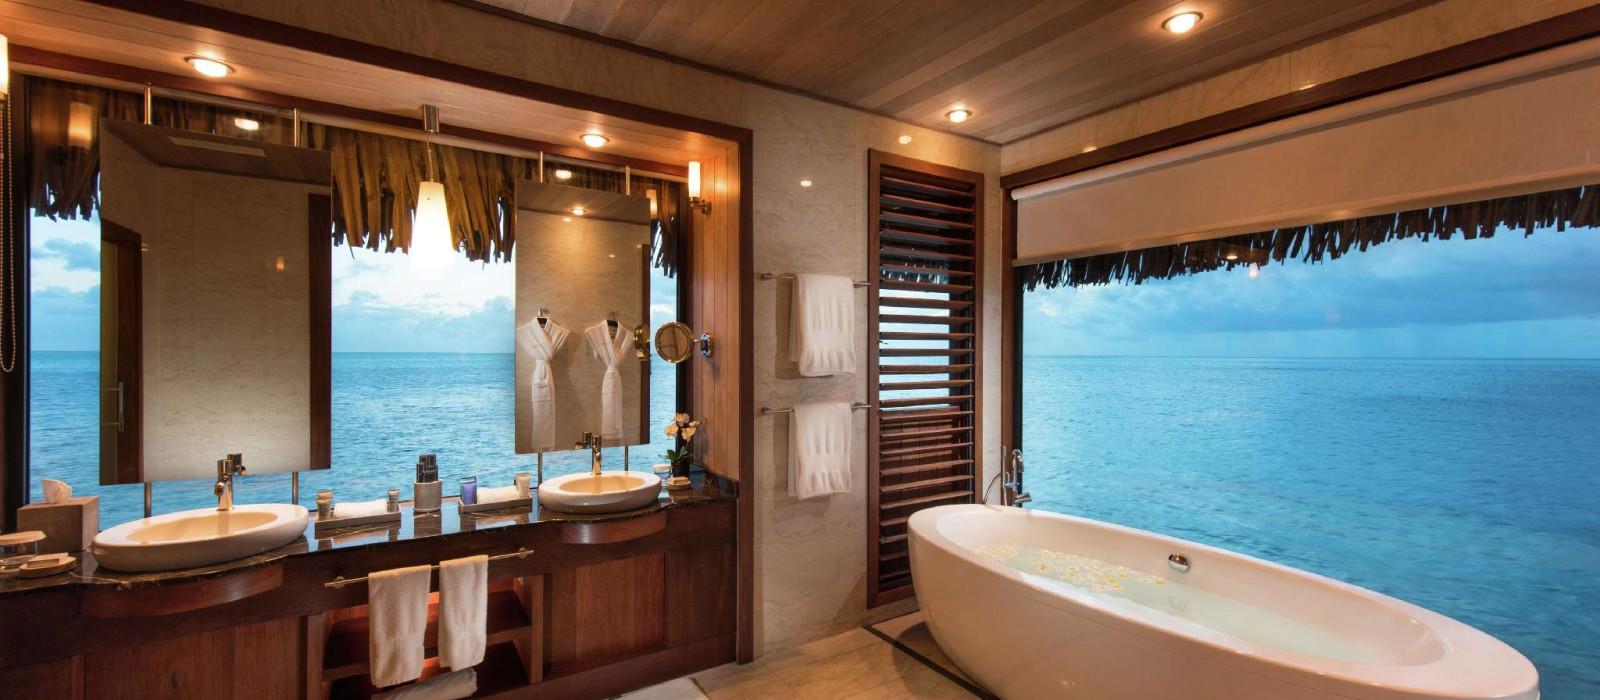 Hotel Conrad Bora Bora Nui Französisch Polynesien